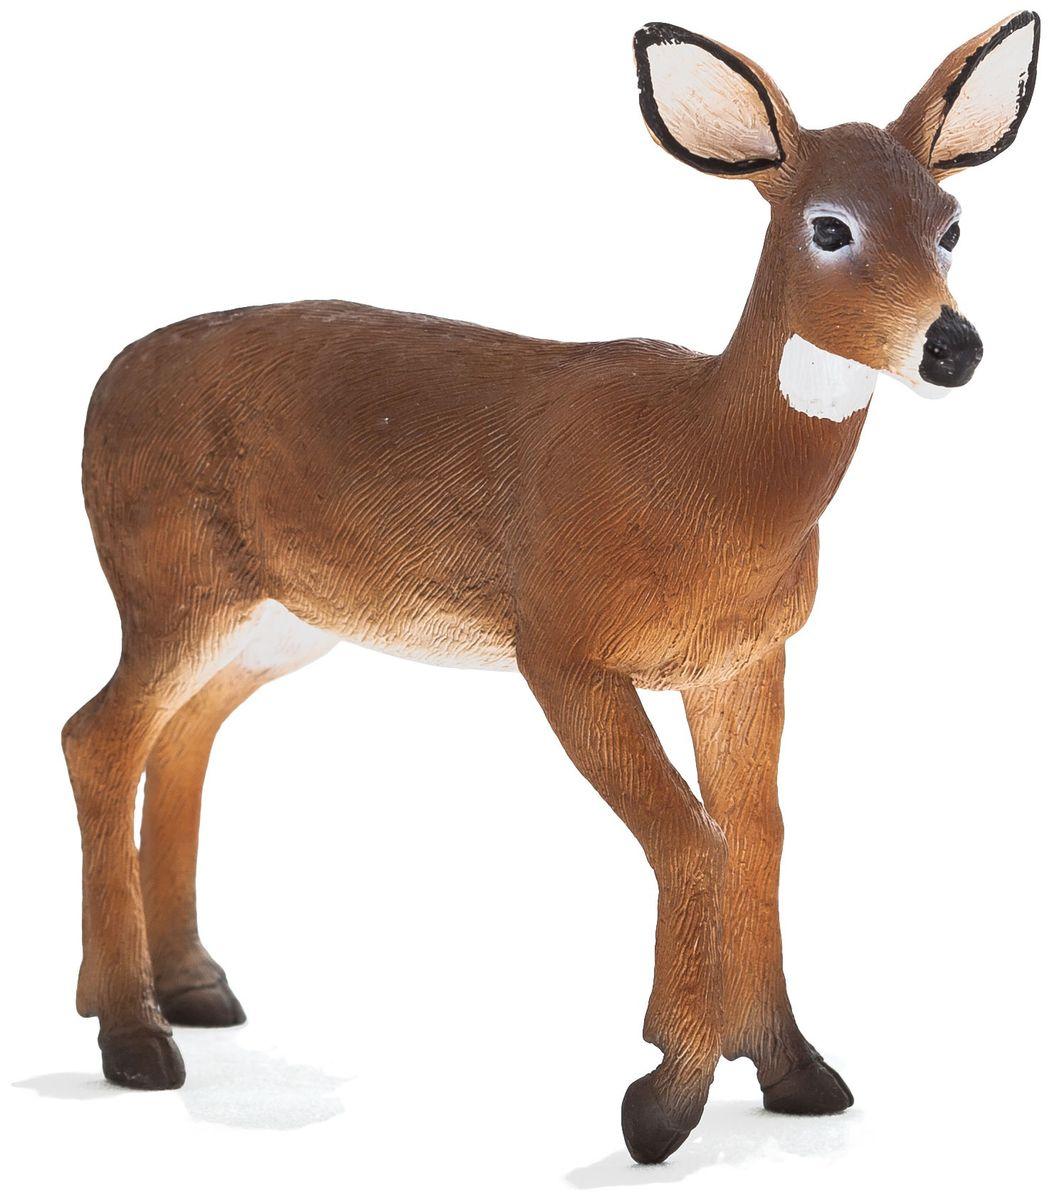 MojoФигурка Белохвостая самка оленя